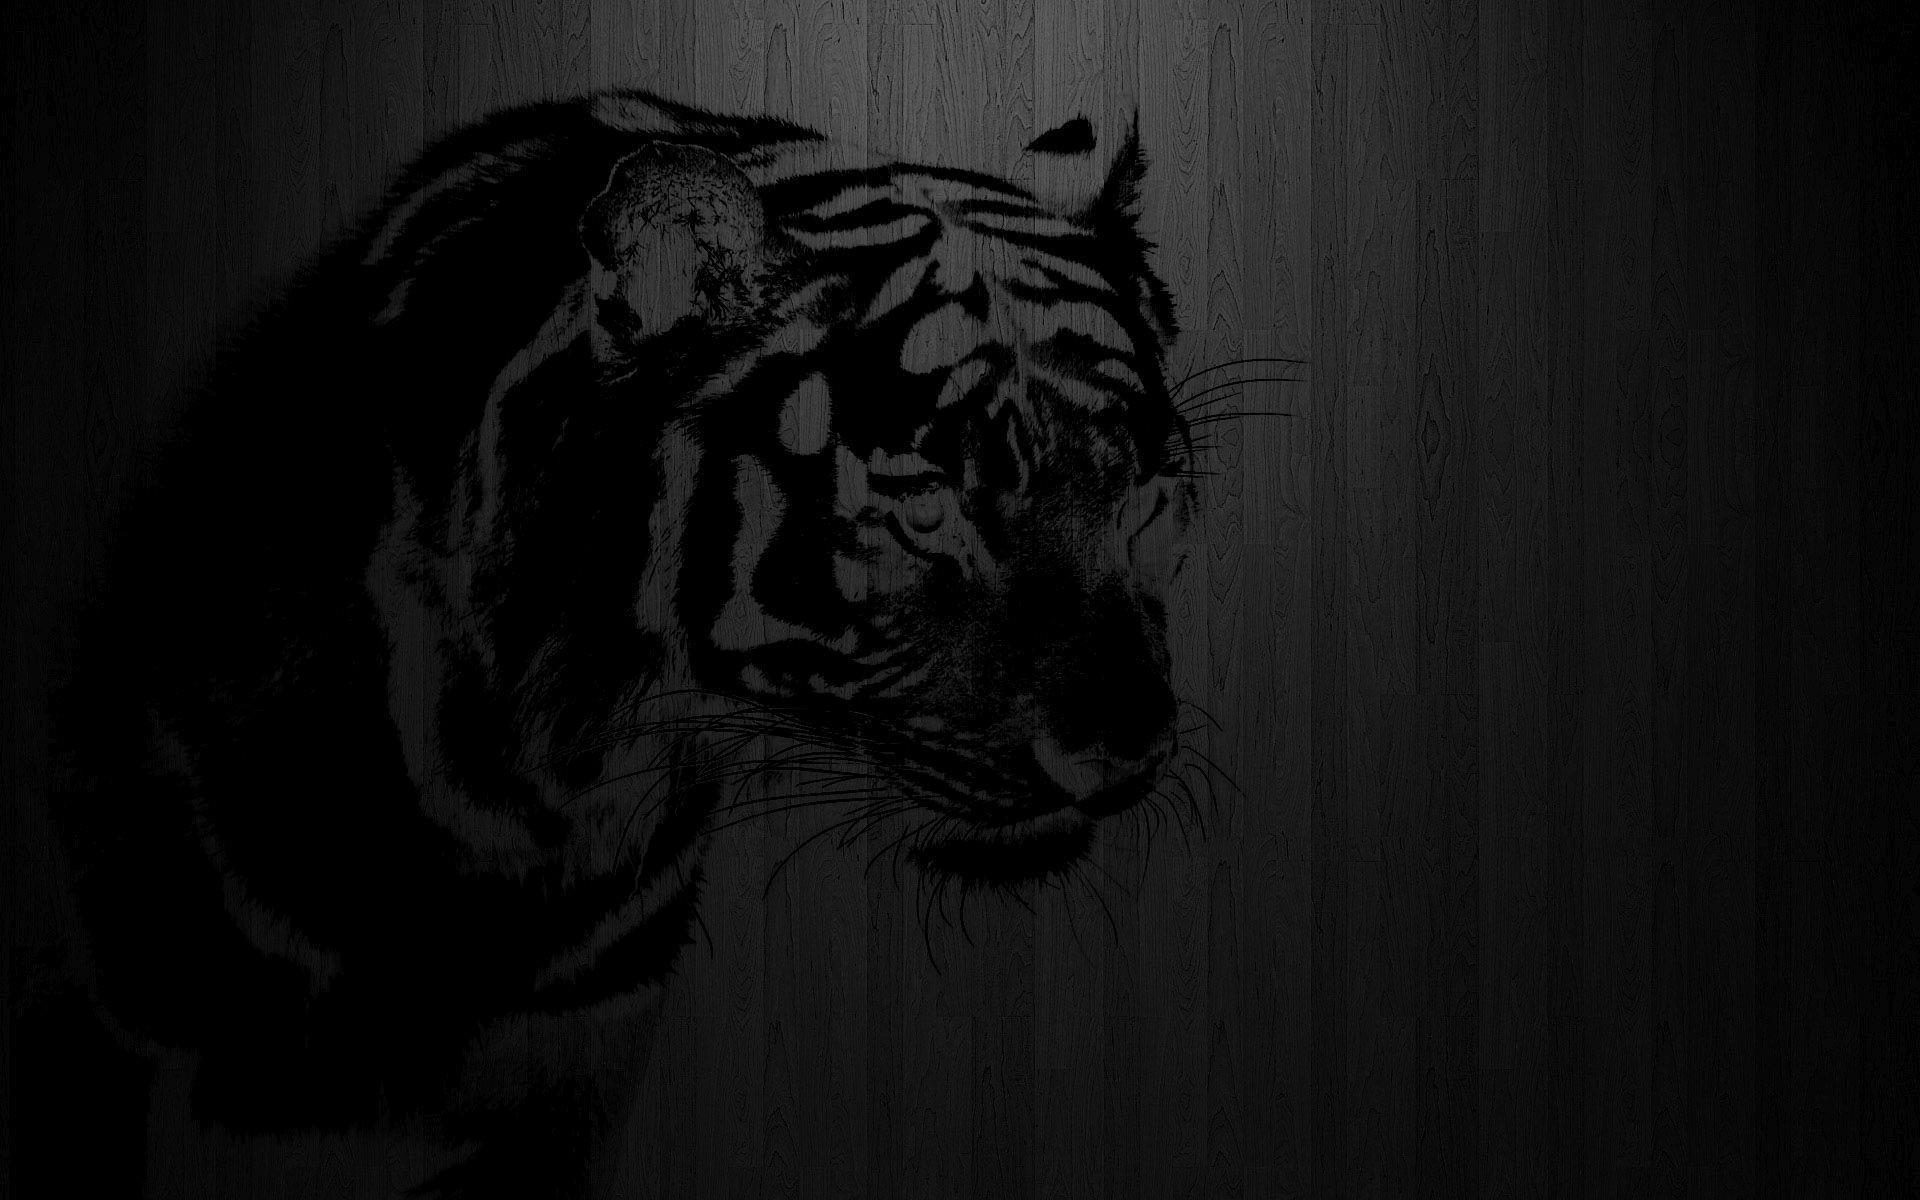 … Black tiger print on wood